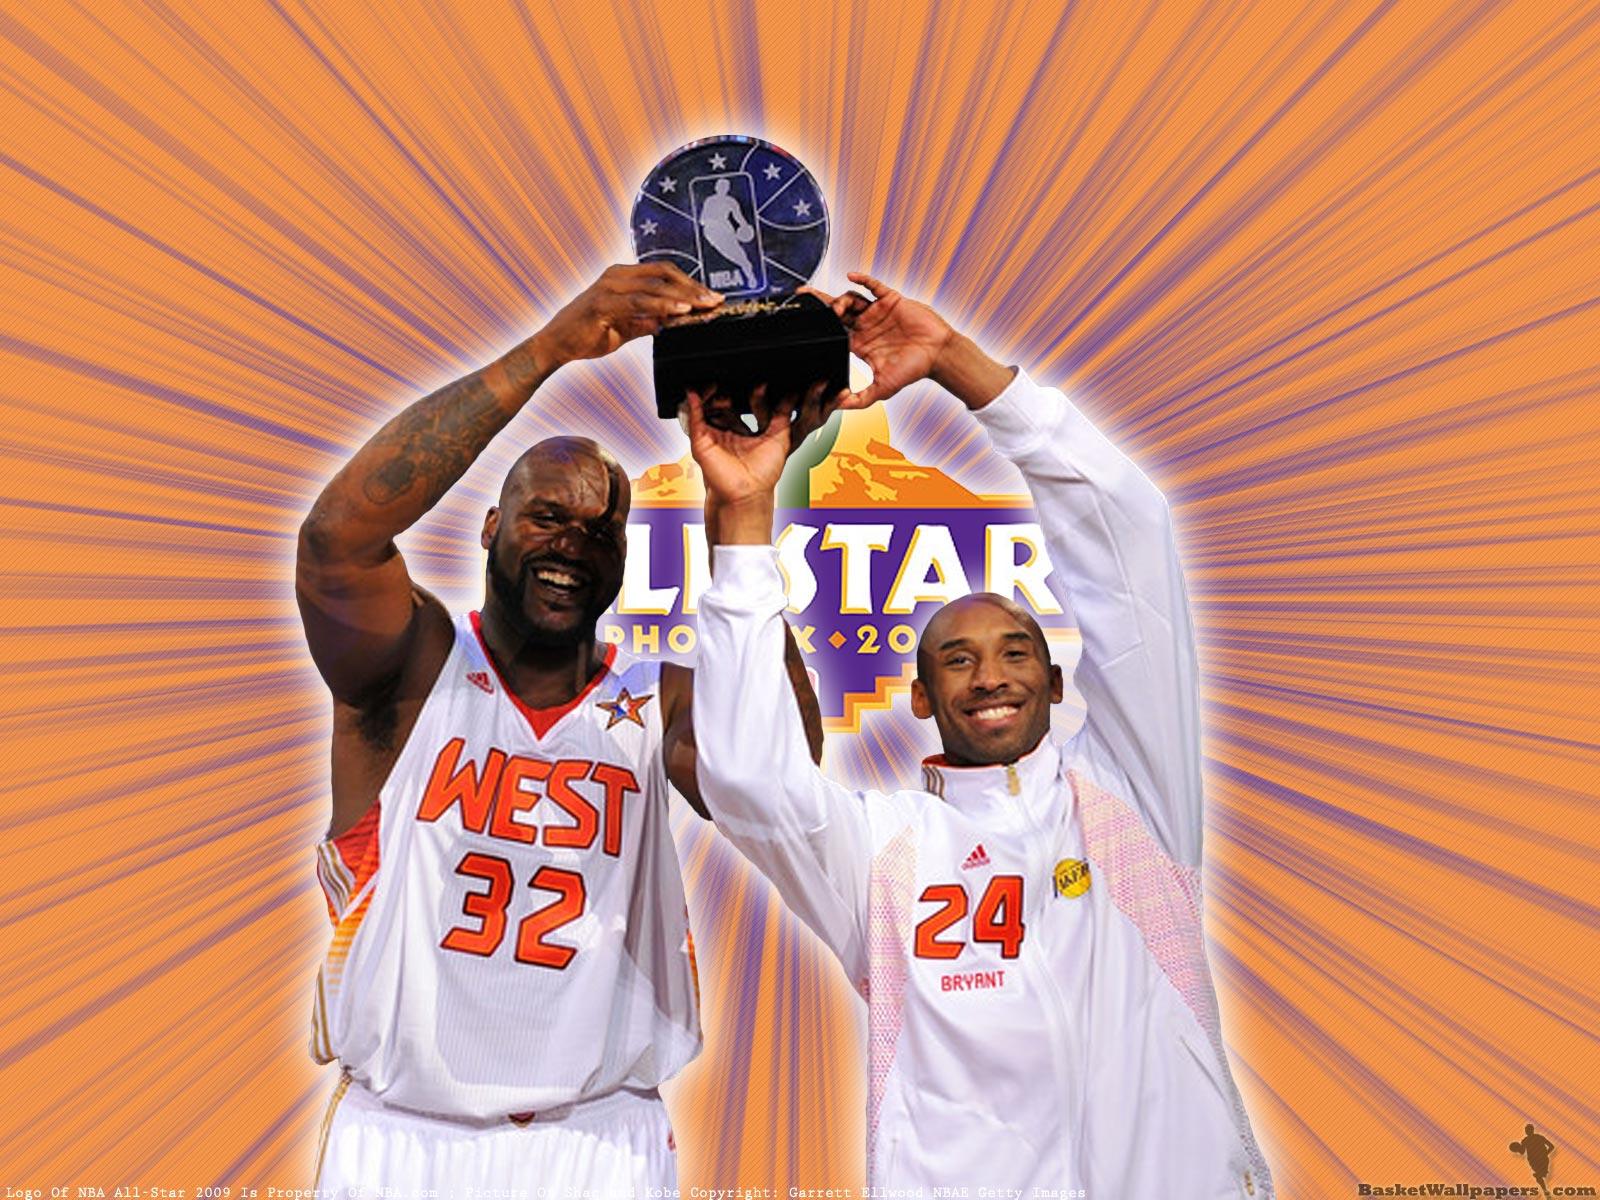 Shaq-And-Kobe-NBA-All-Star-2009-MVPs-Wallpaper.jpg